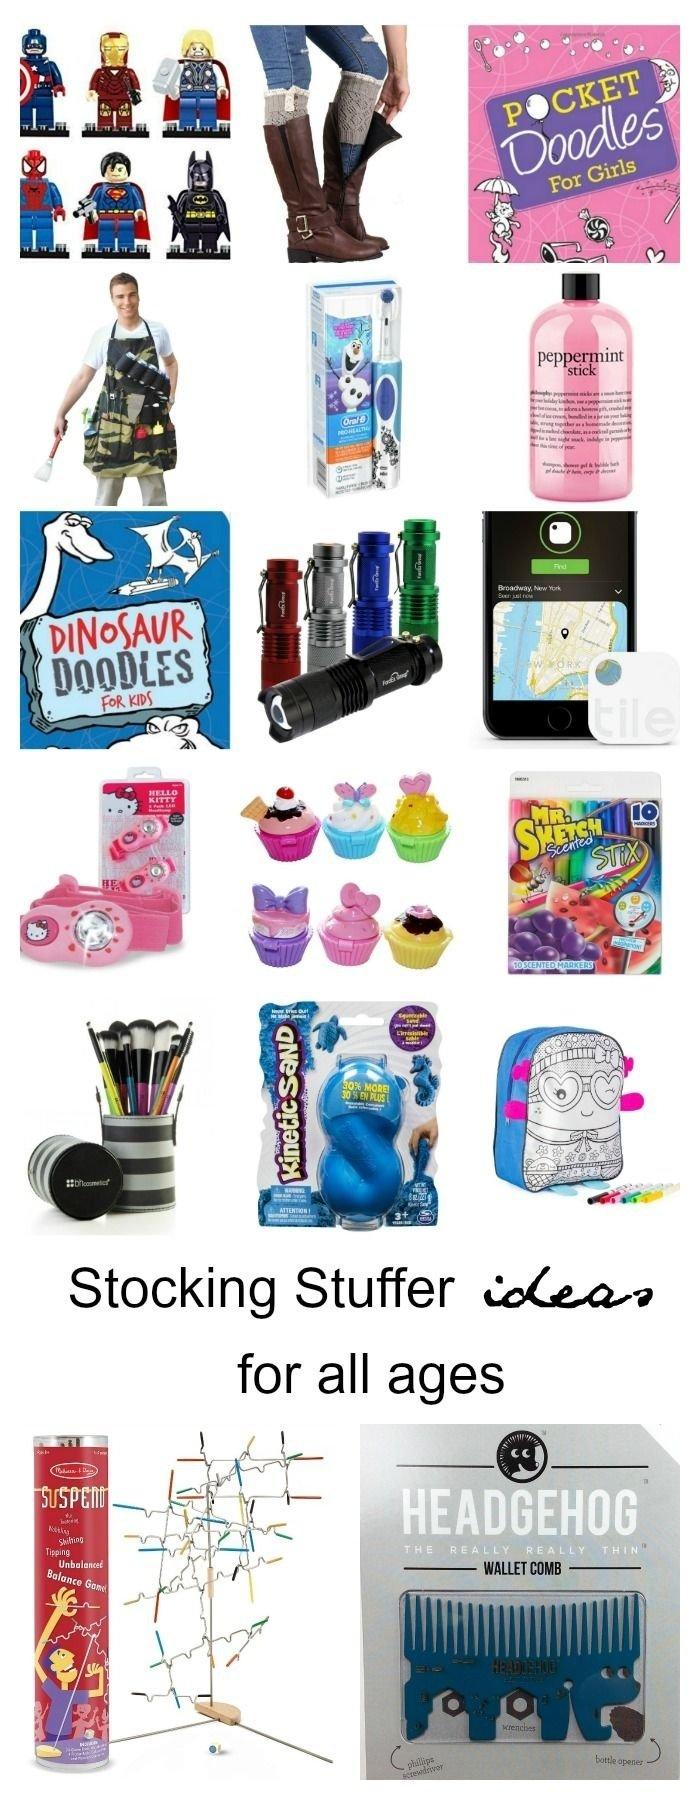 10 Pretty Stocking Stuffer Ideas For Teenage Girls stocking stuffer ideas for all ages